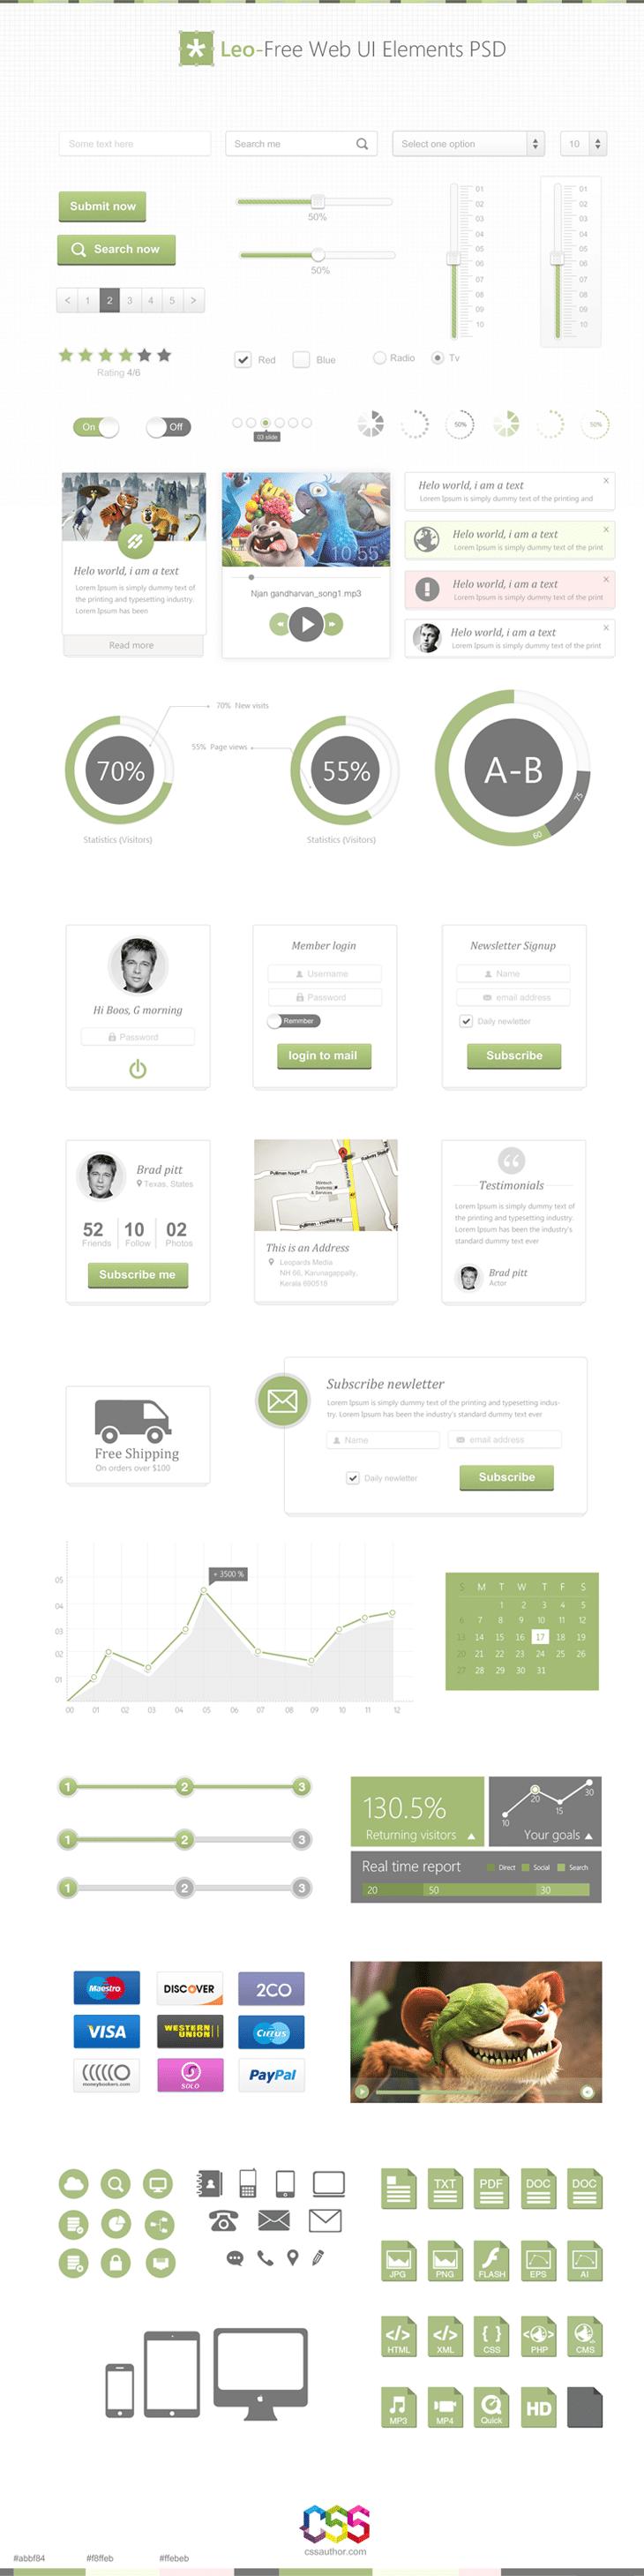 Leo - Free Web UI Elements PSD for Free Download - cssauthor.com